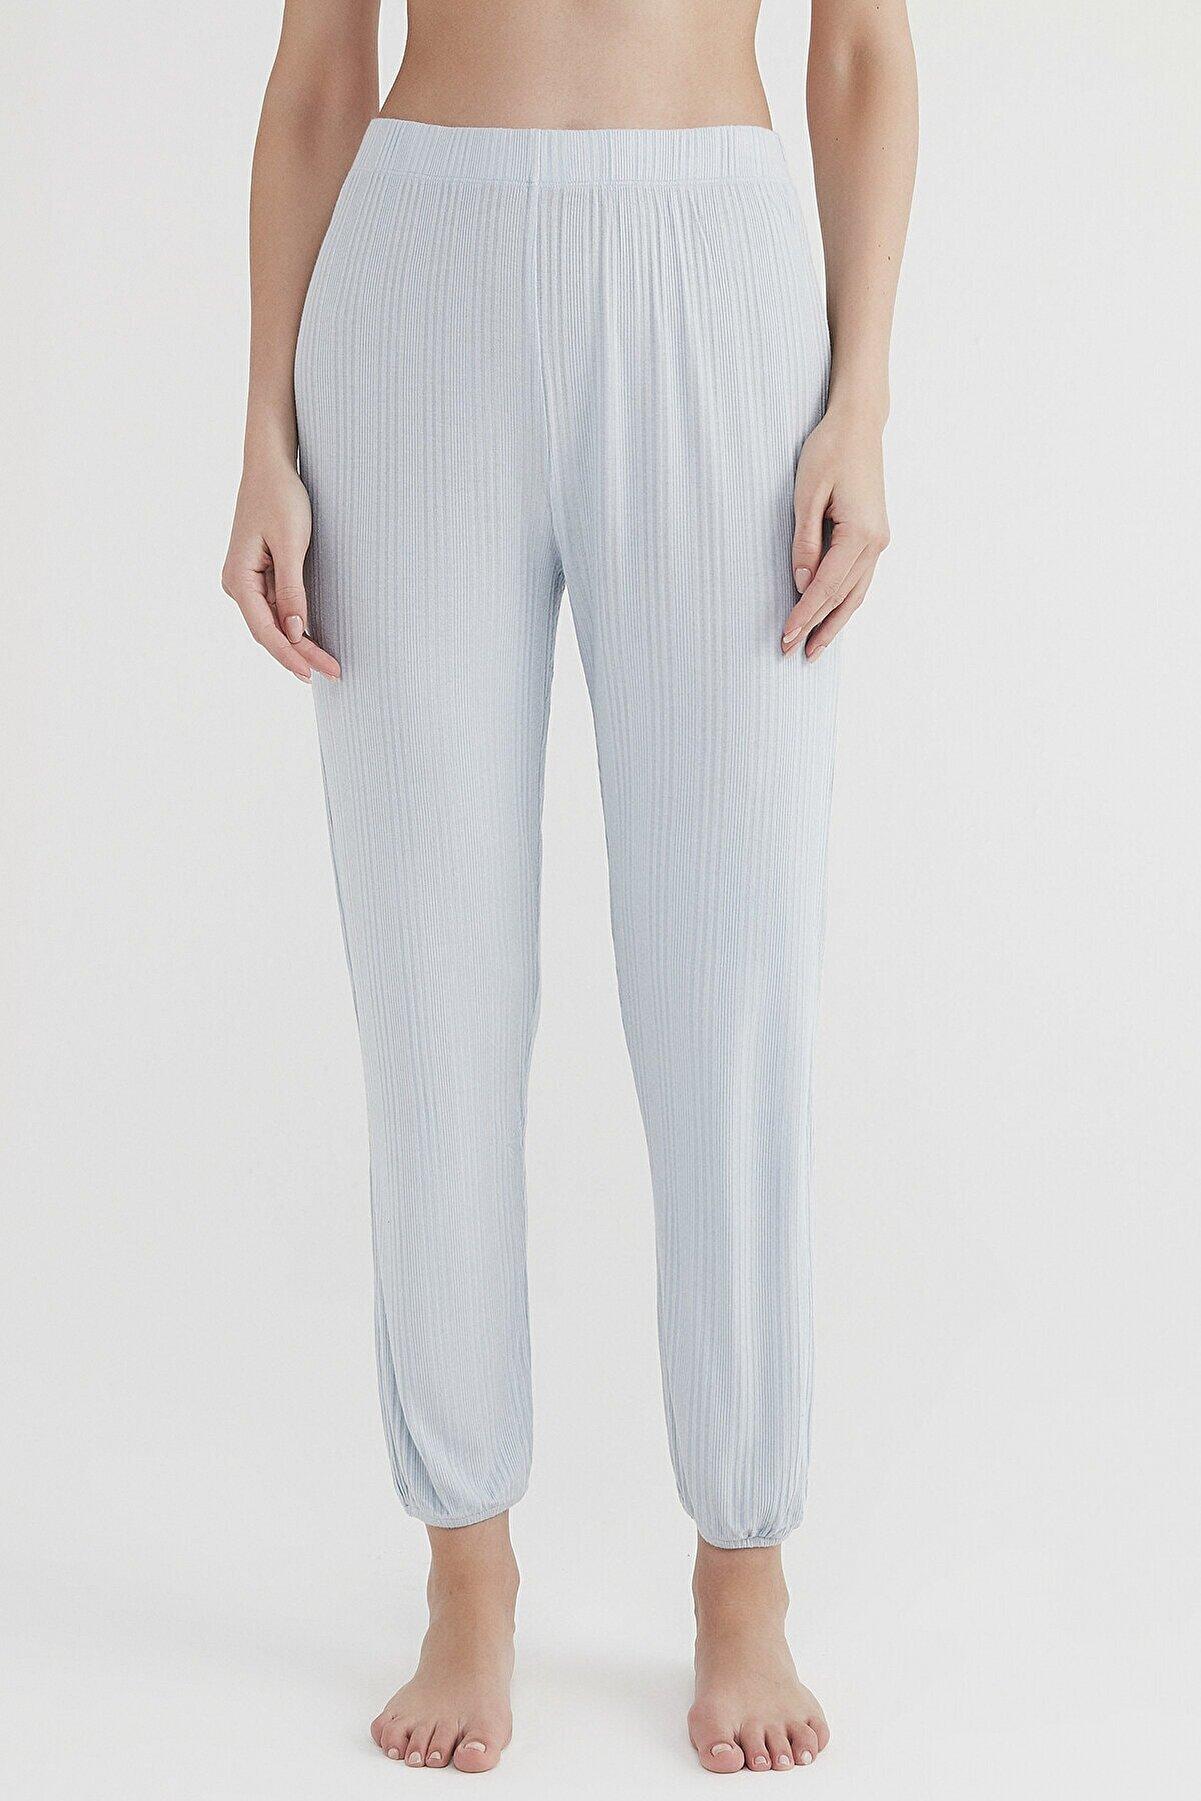 Penti Kadın Renkli Lounge Blue Pantolon